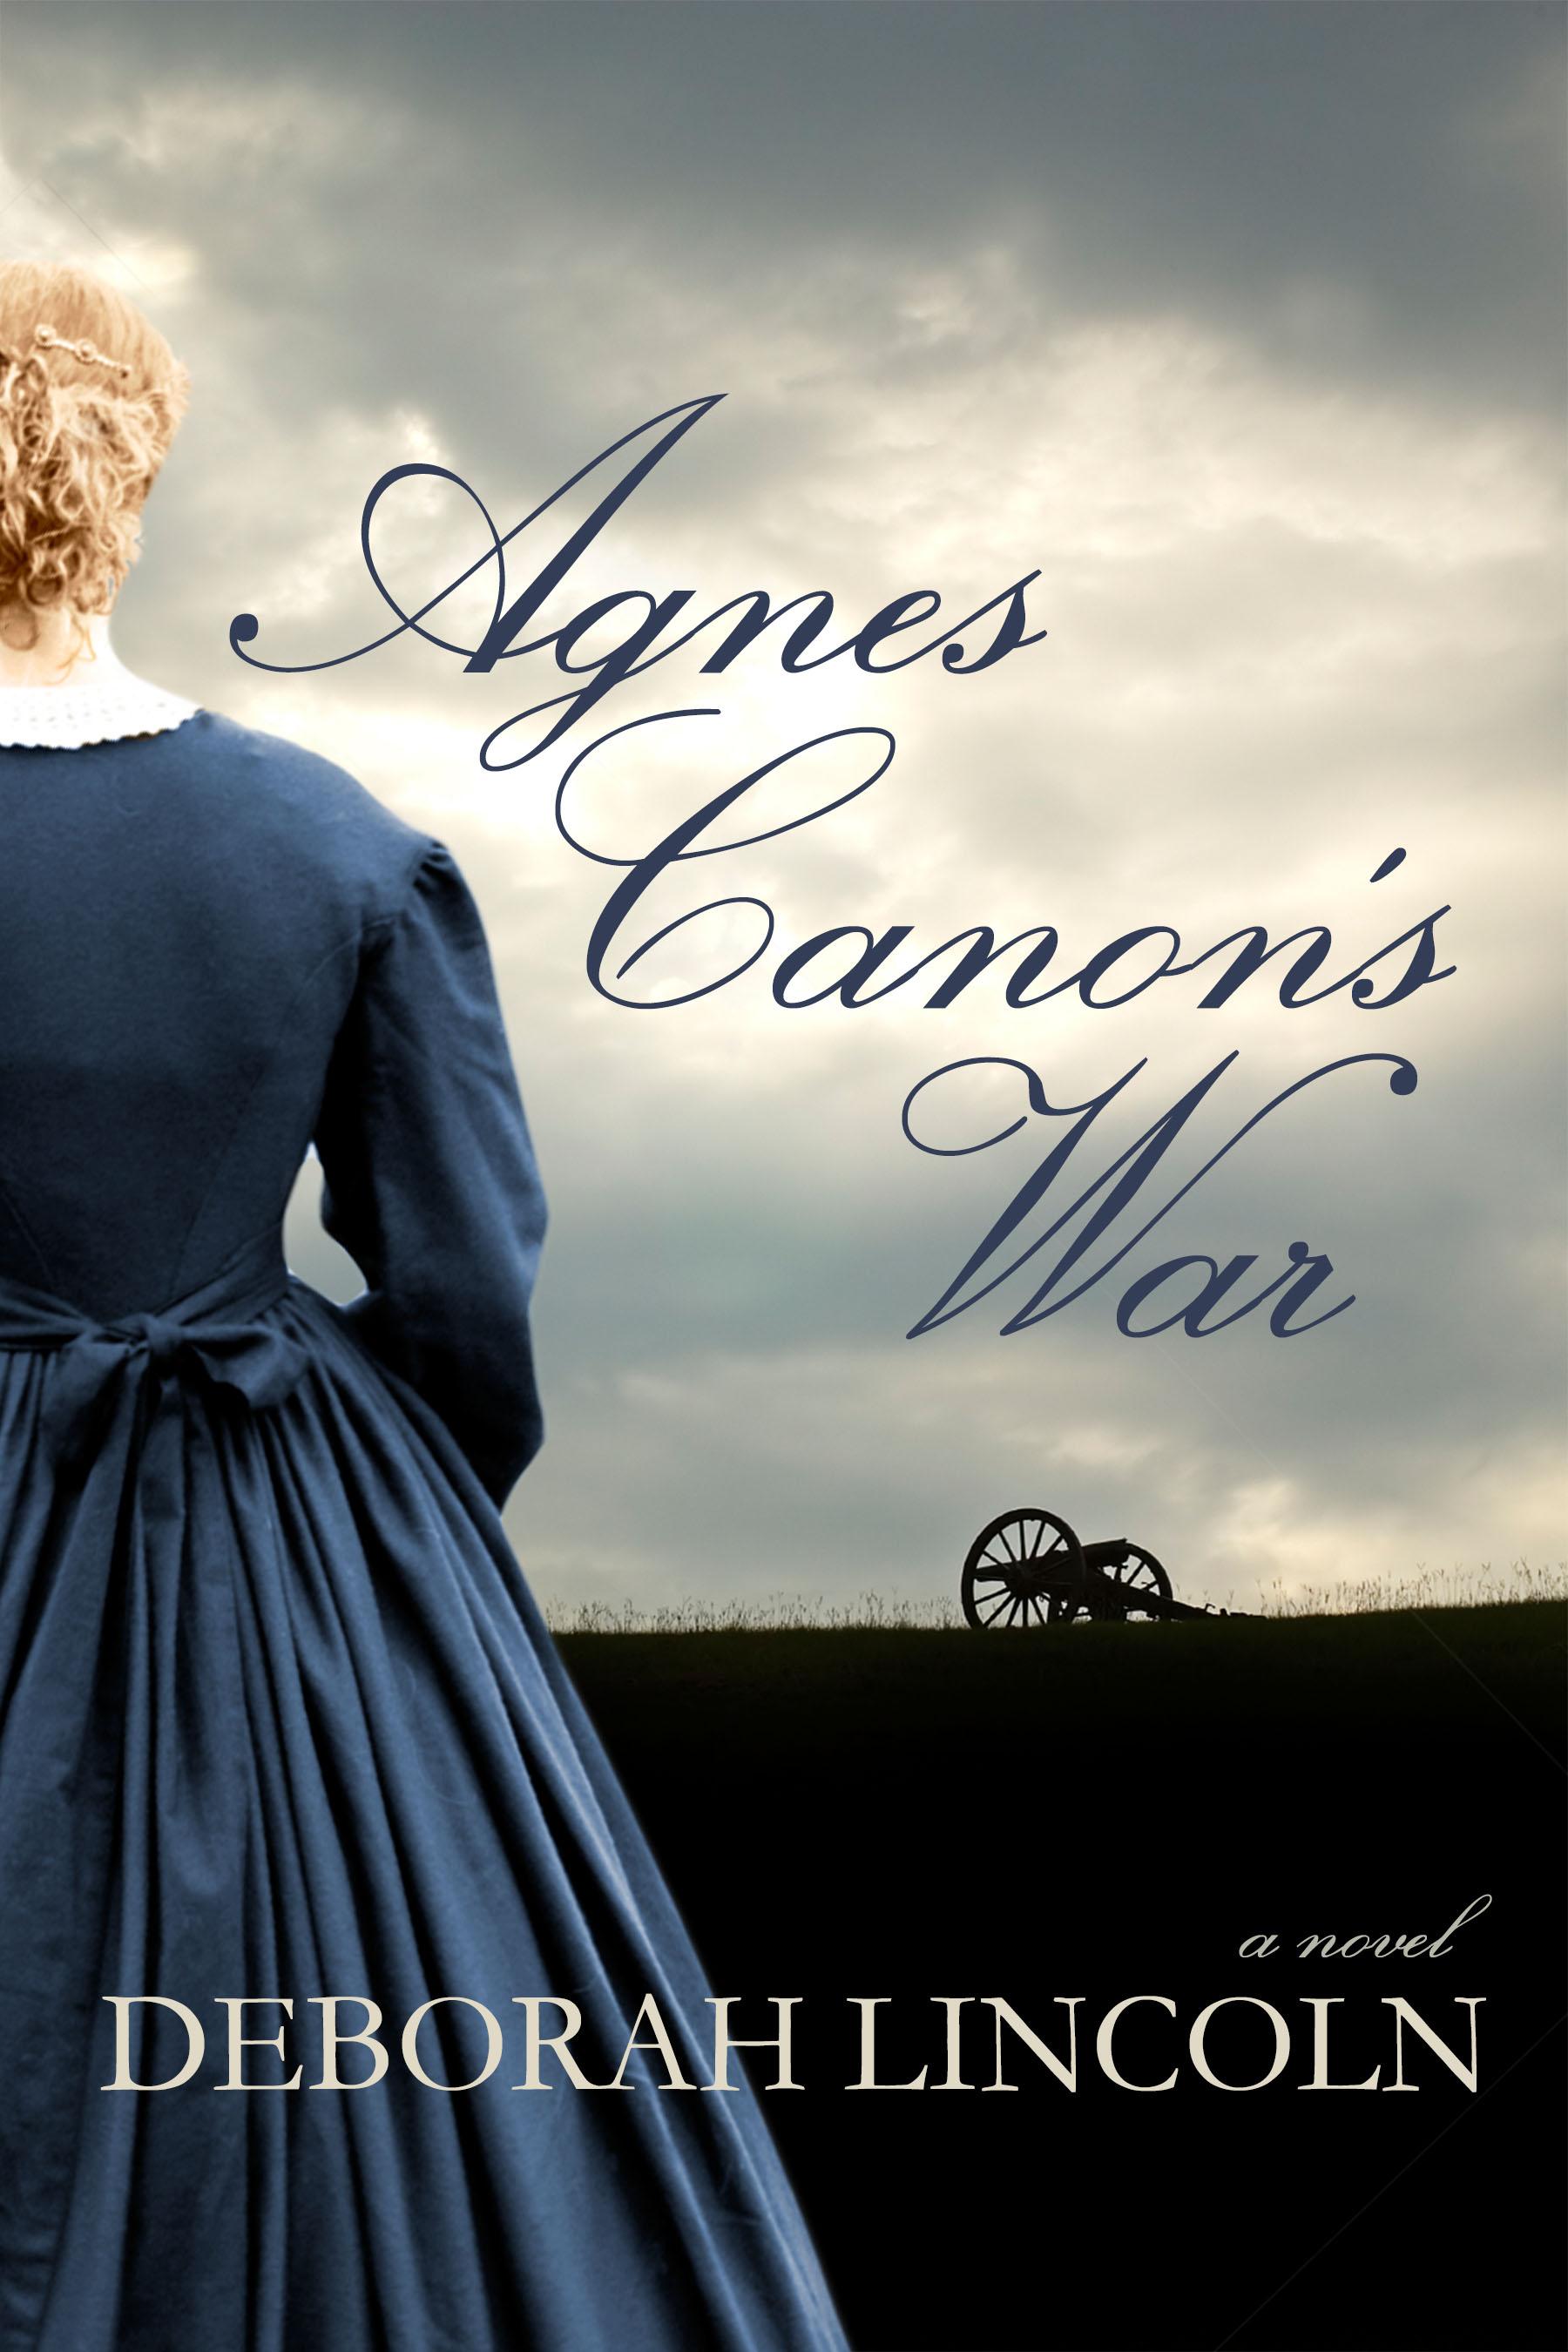 02_Agnes Canon's War